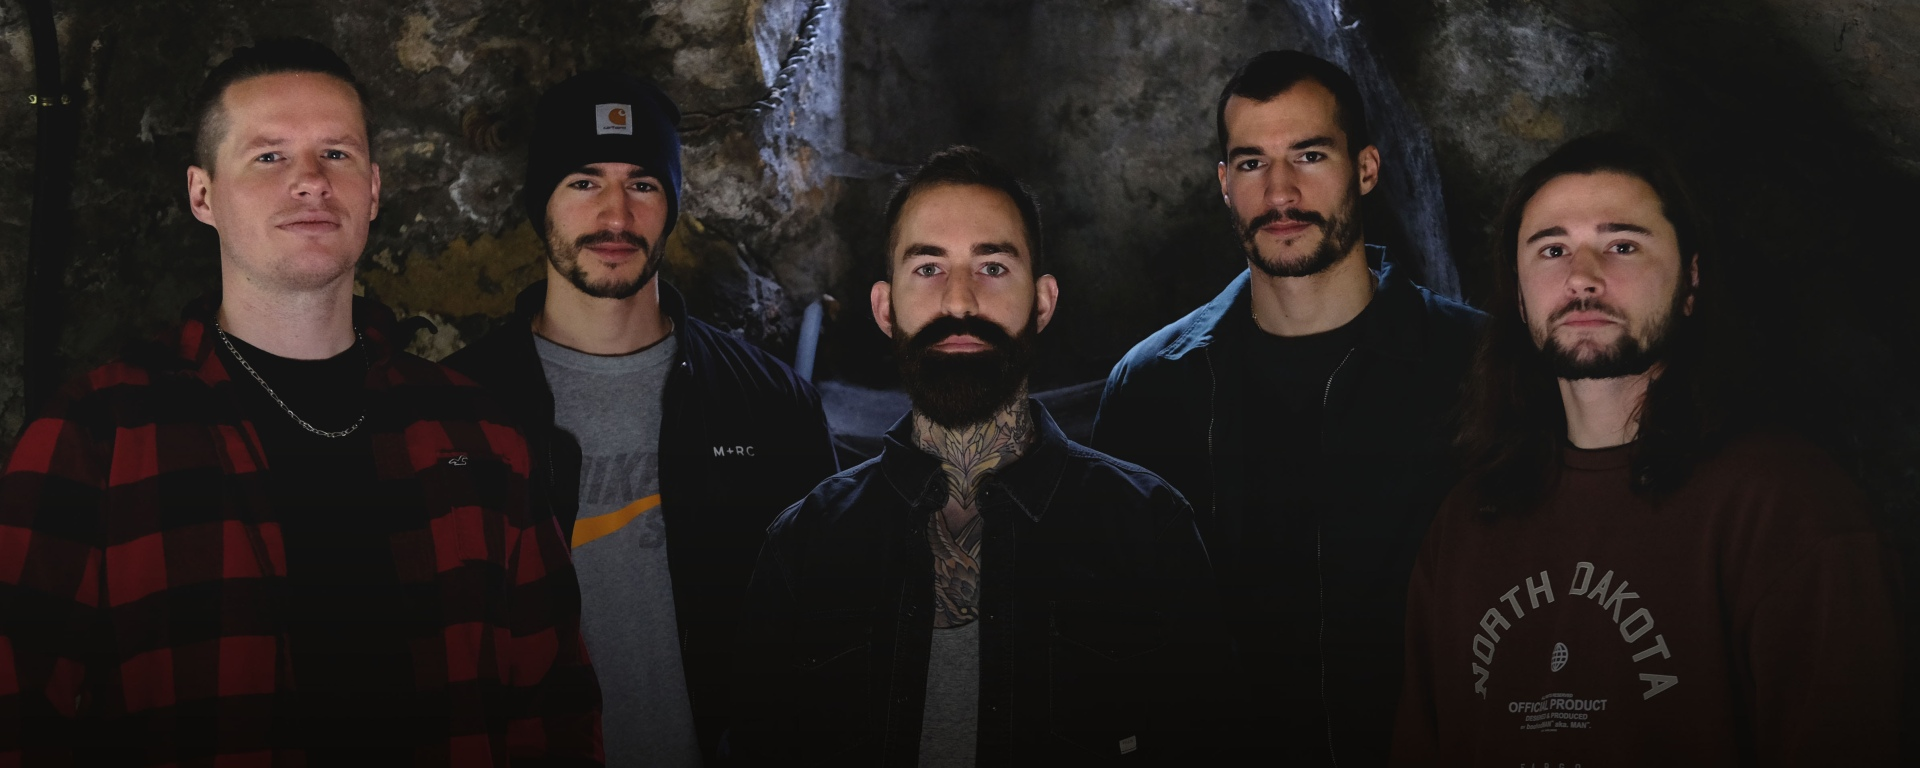 "PATHFINDERS Unleash New Video ""Impostors"", New Album ""Ares Vallis"" Out April 16th via Music-Records"